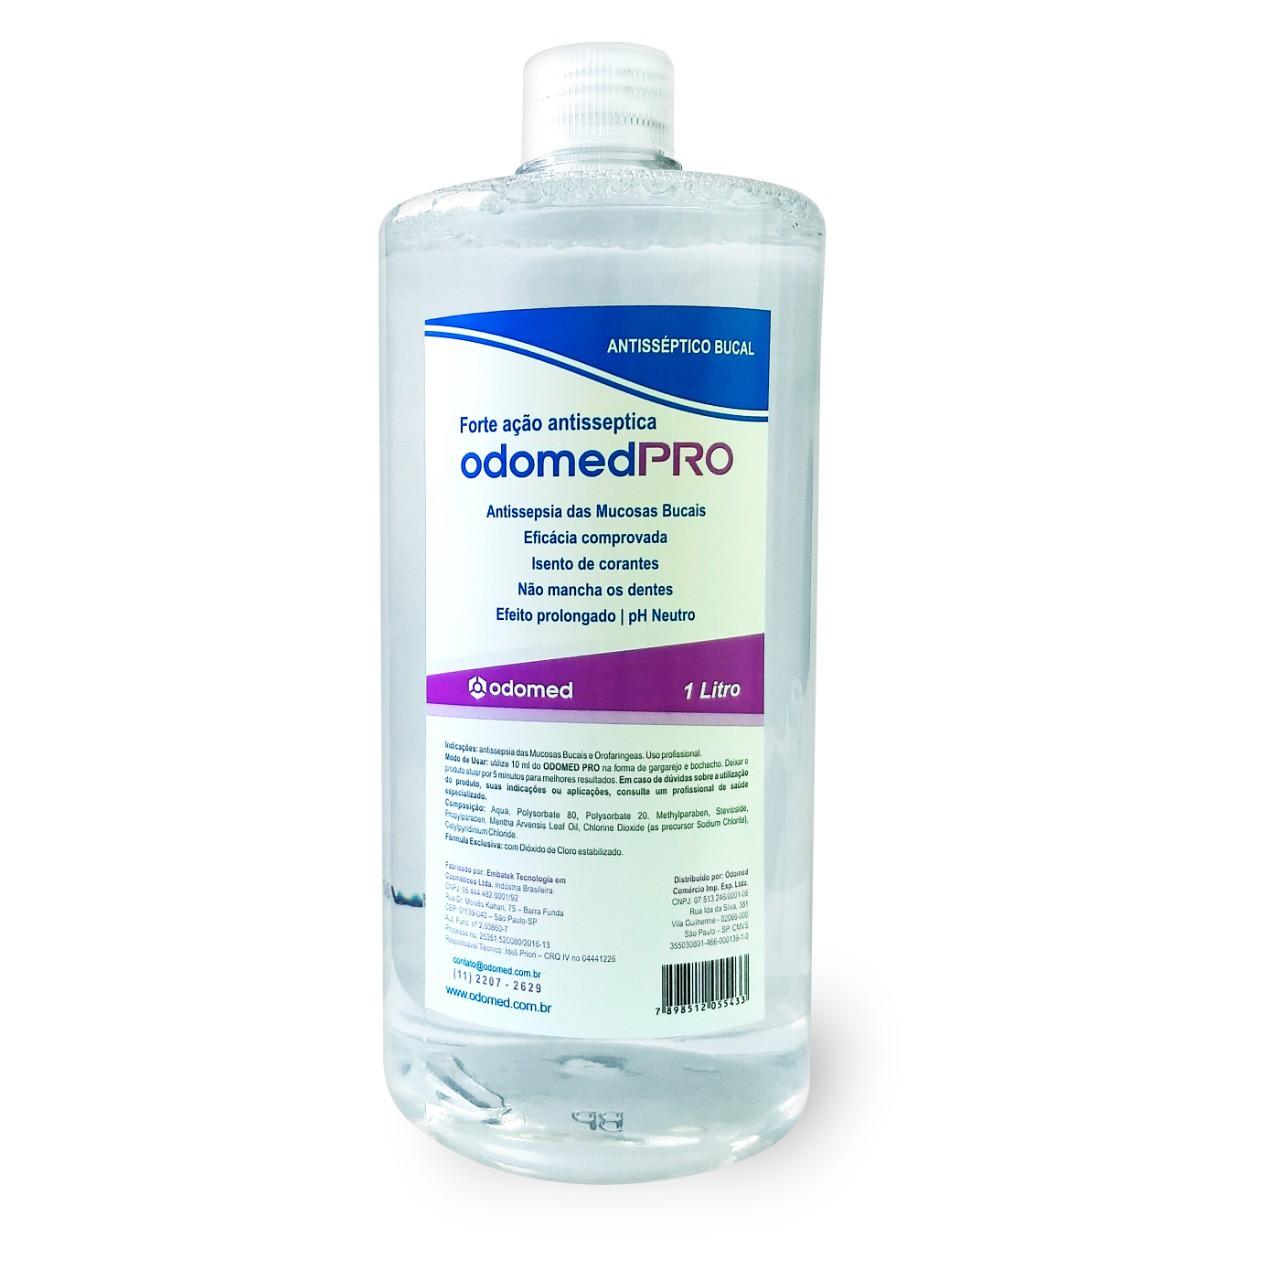 Enxaguante OdomedPRO - 1 litro